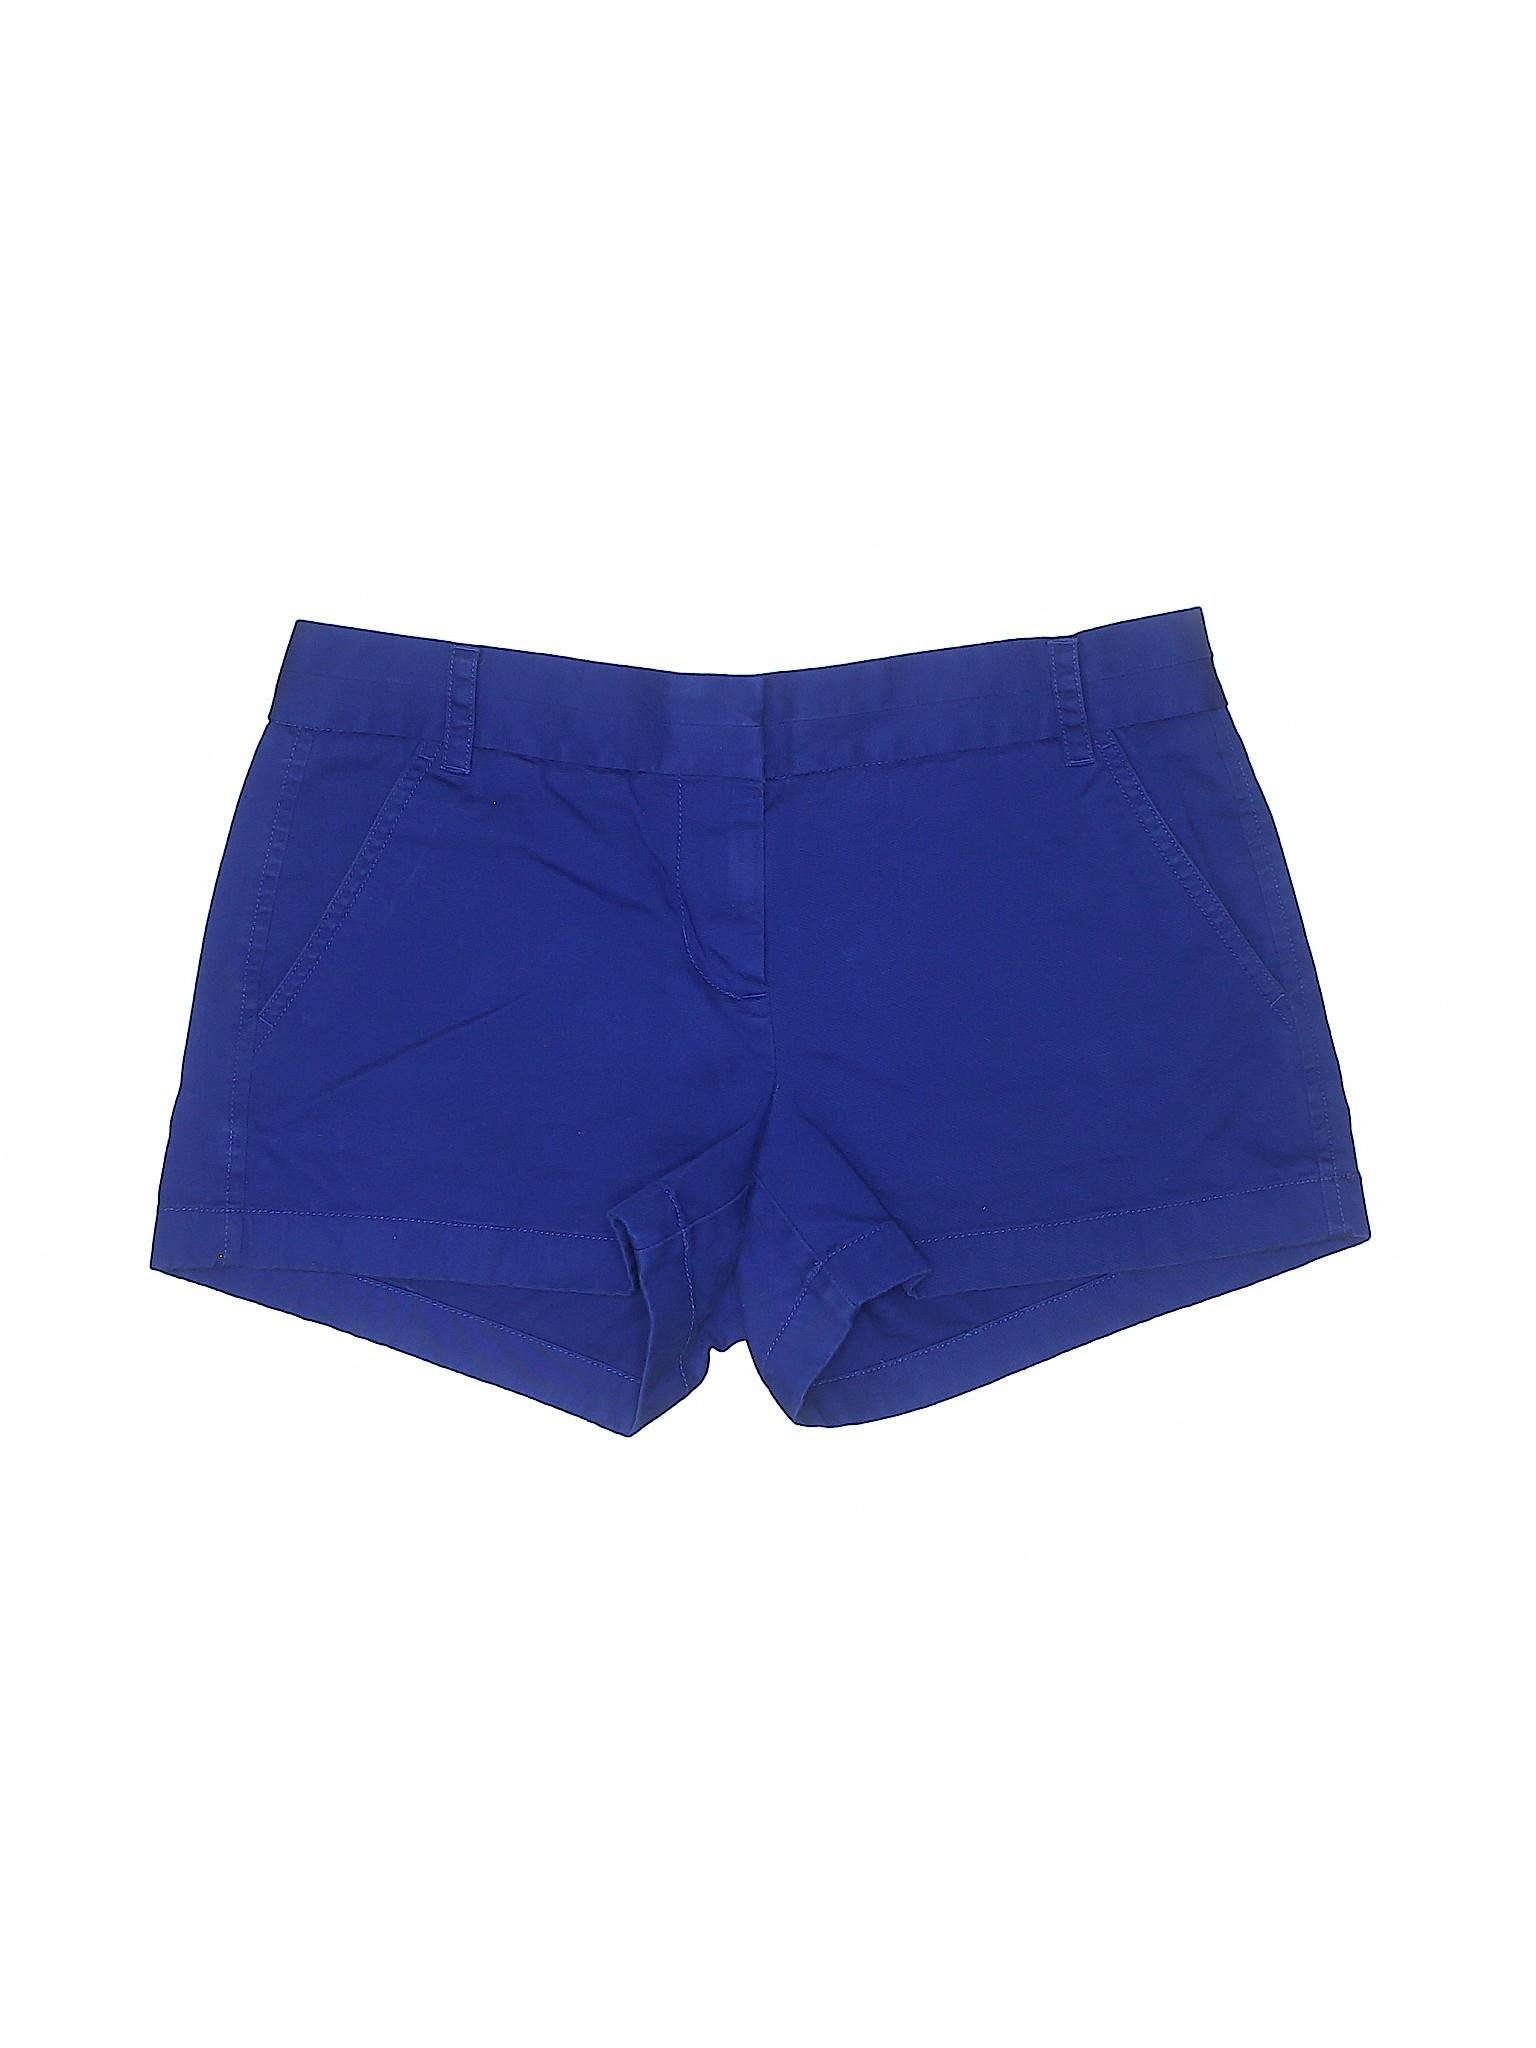 Khaki Shorts Crew leisure J Boutique wqFtzH6xv